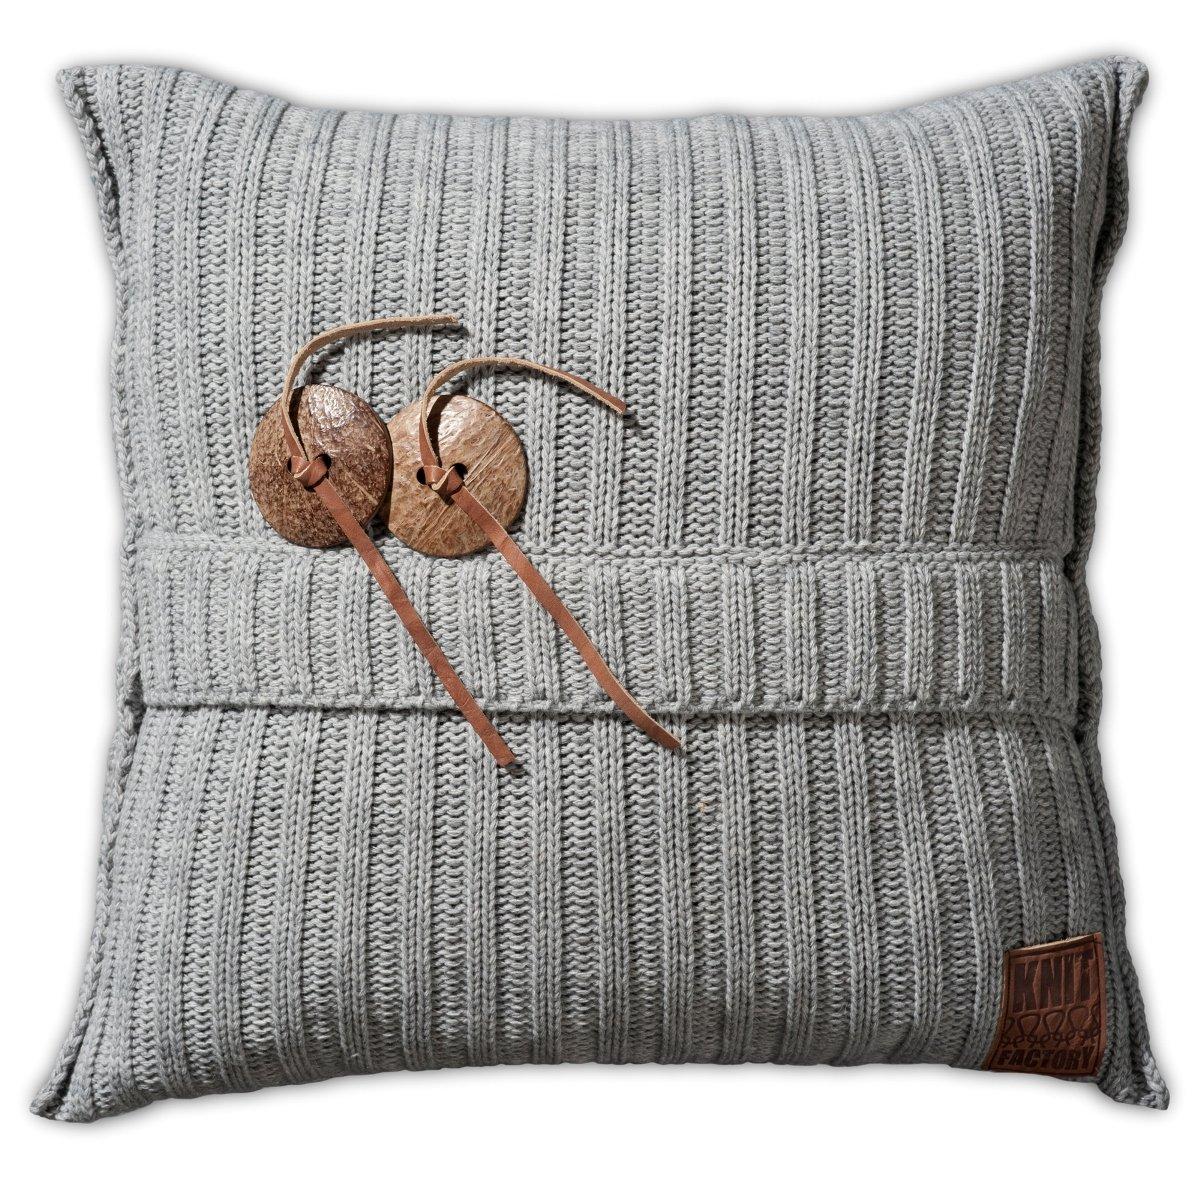 Knit Factory Dekokissen Strickkissen Aran   50 x 50 cm Grau (mit Füllung)